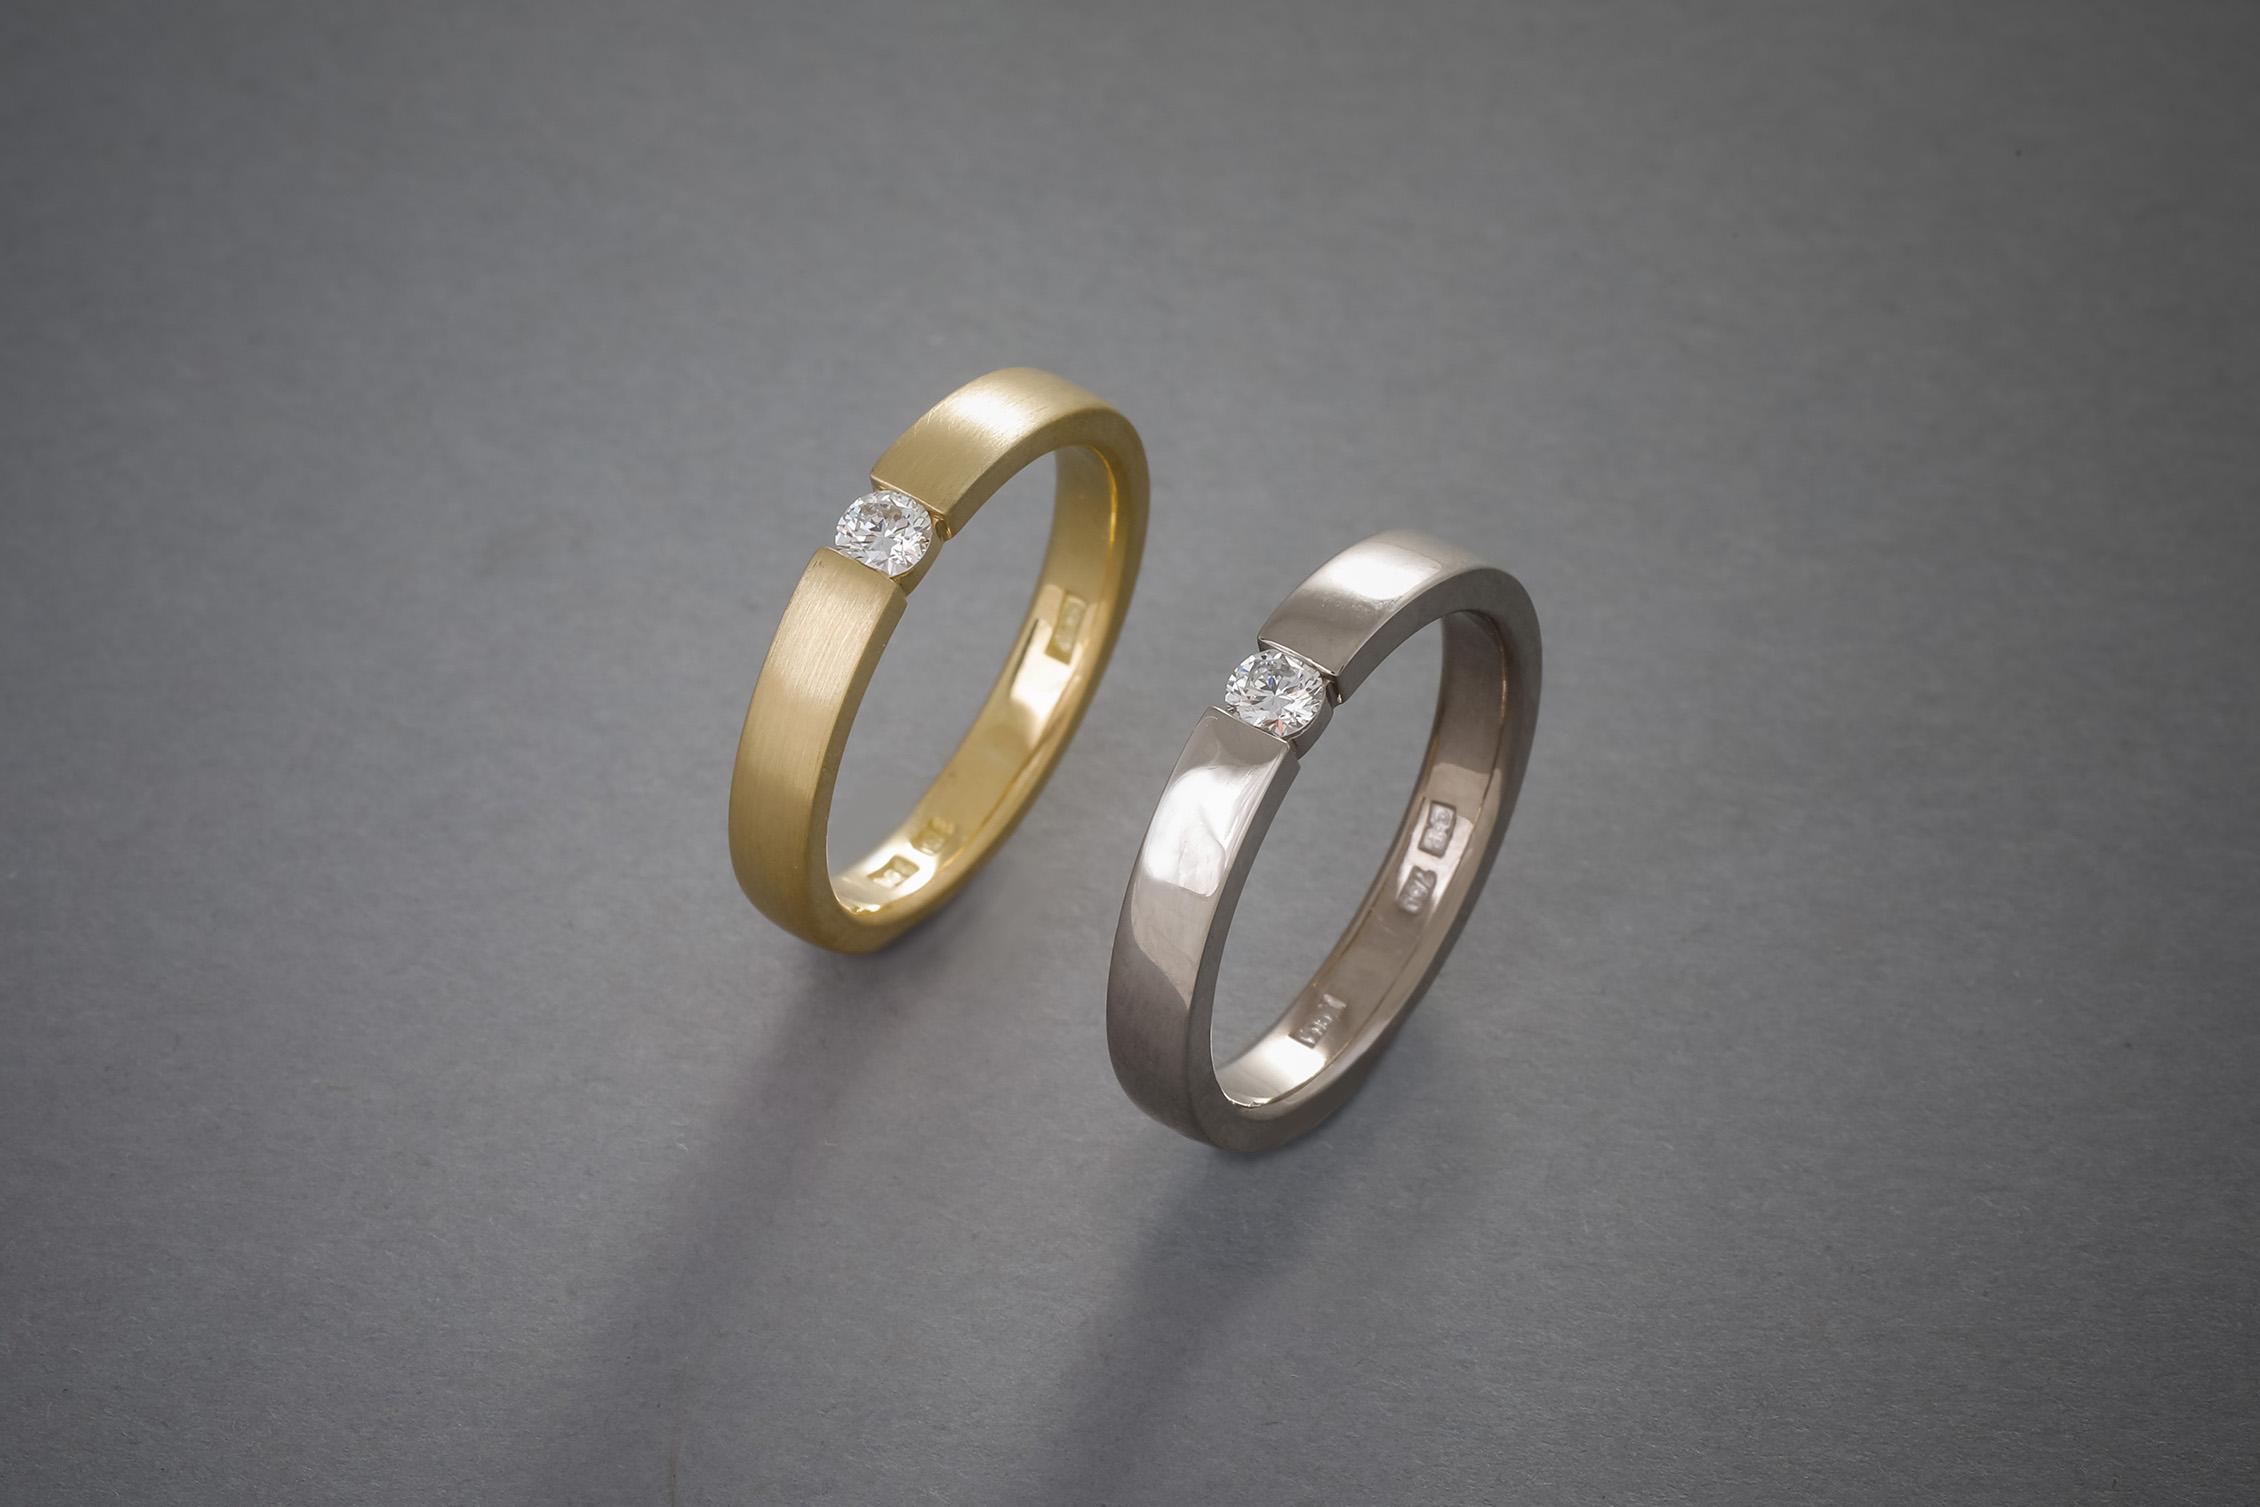 044 18kt Gelbgoldring, Brillant, ab € 1148,-, 18kt Weißgoldring, Brillant, ab € 1228,-